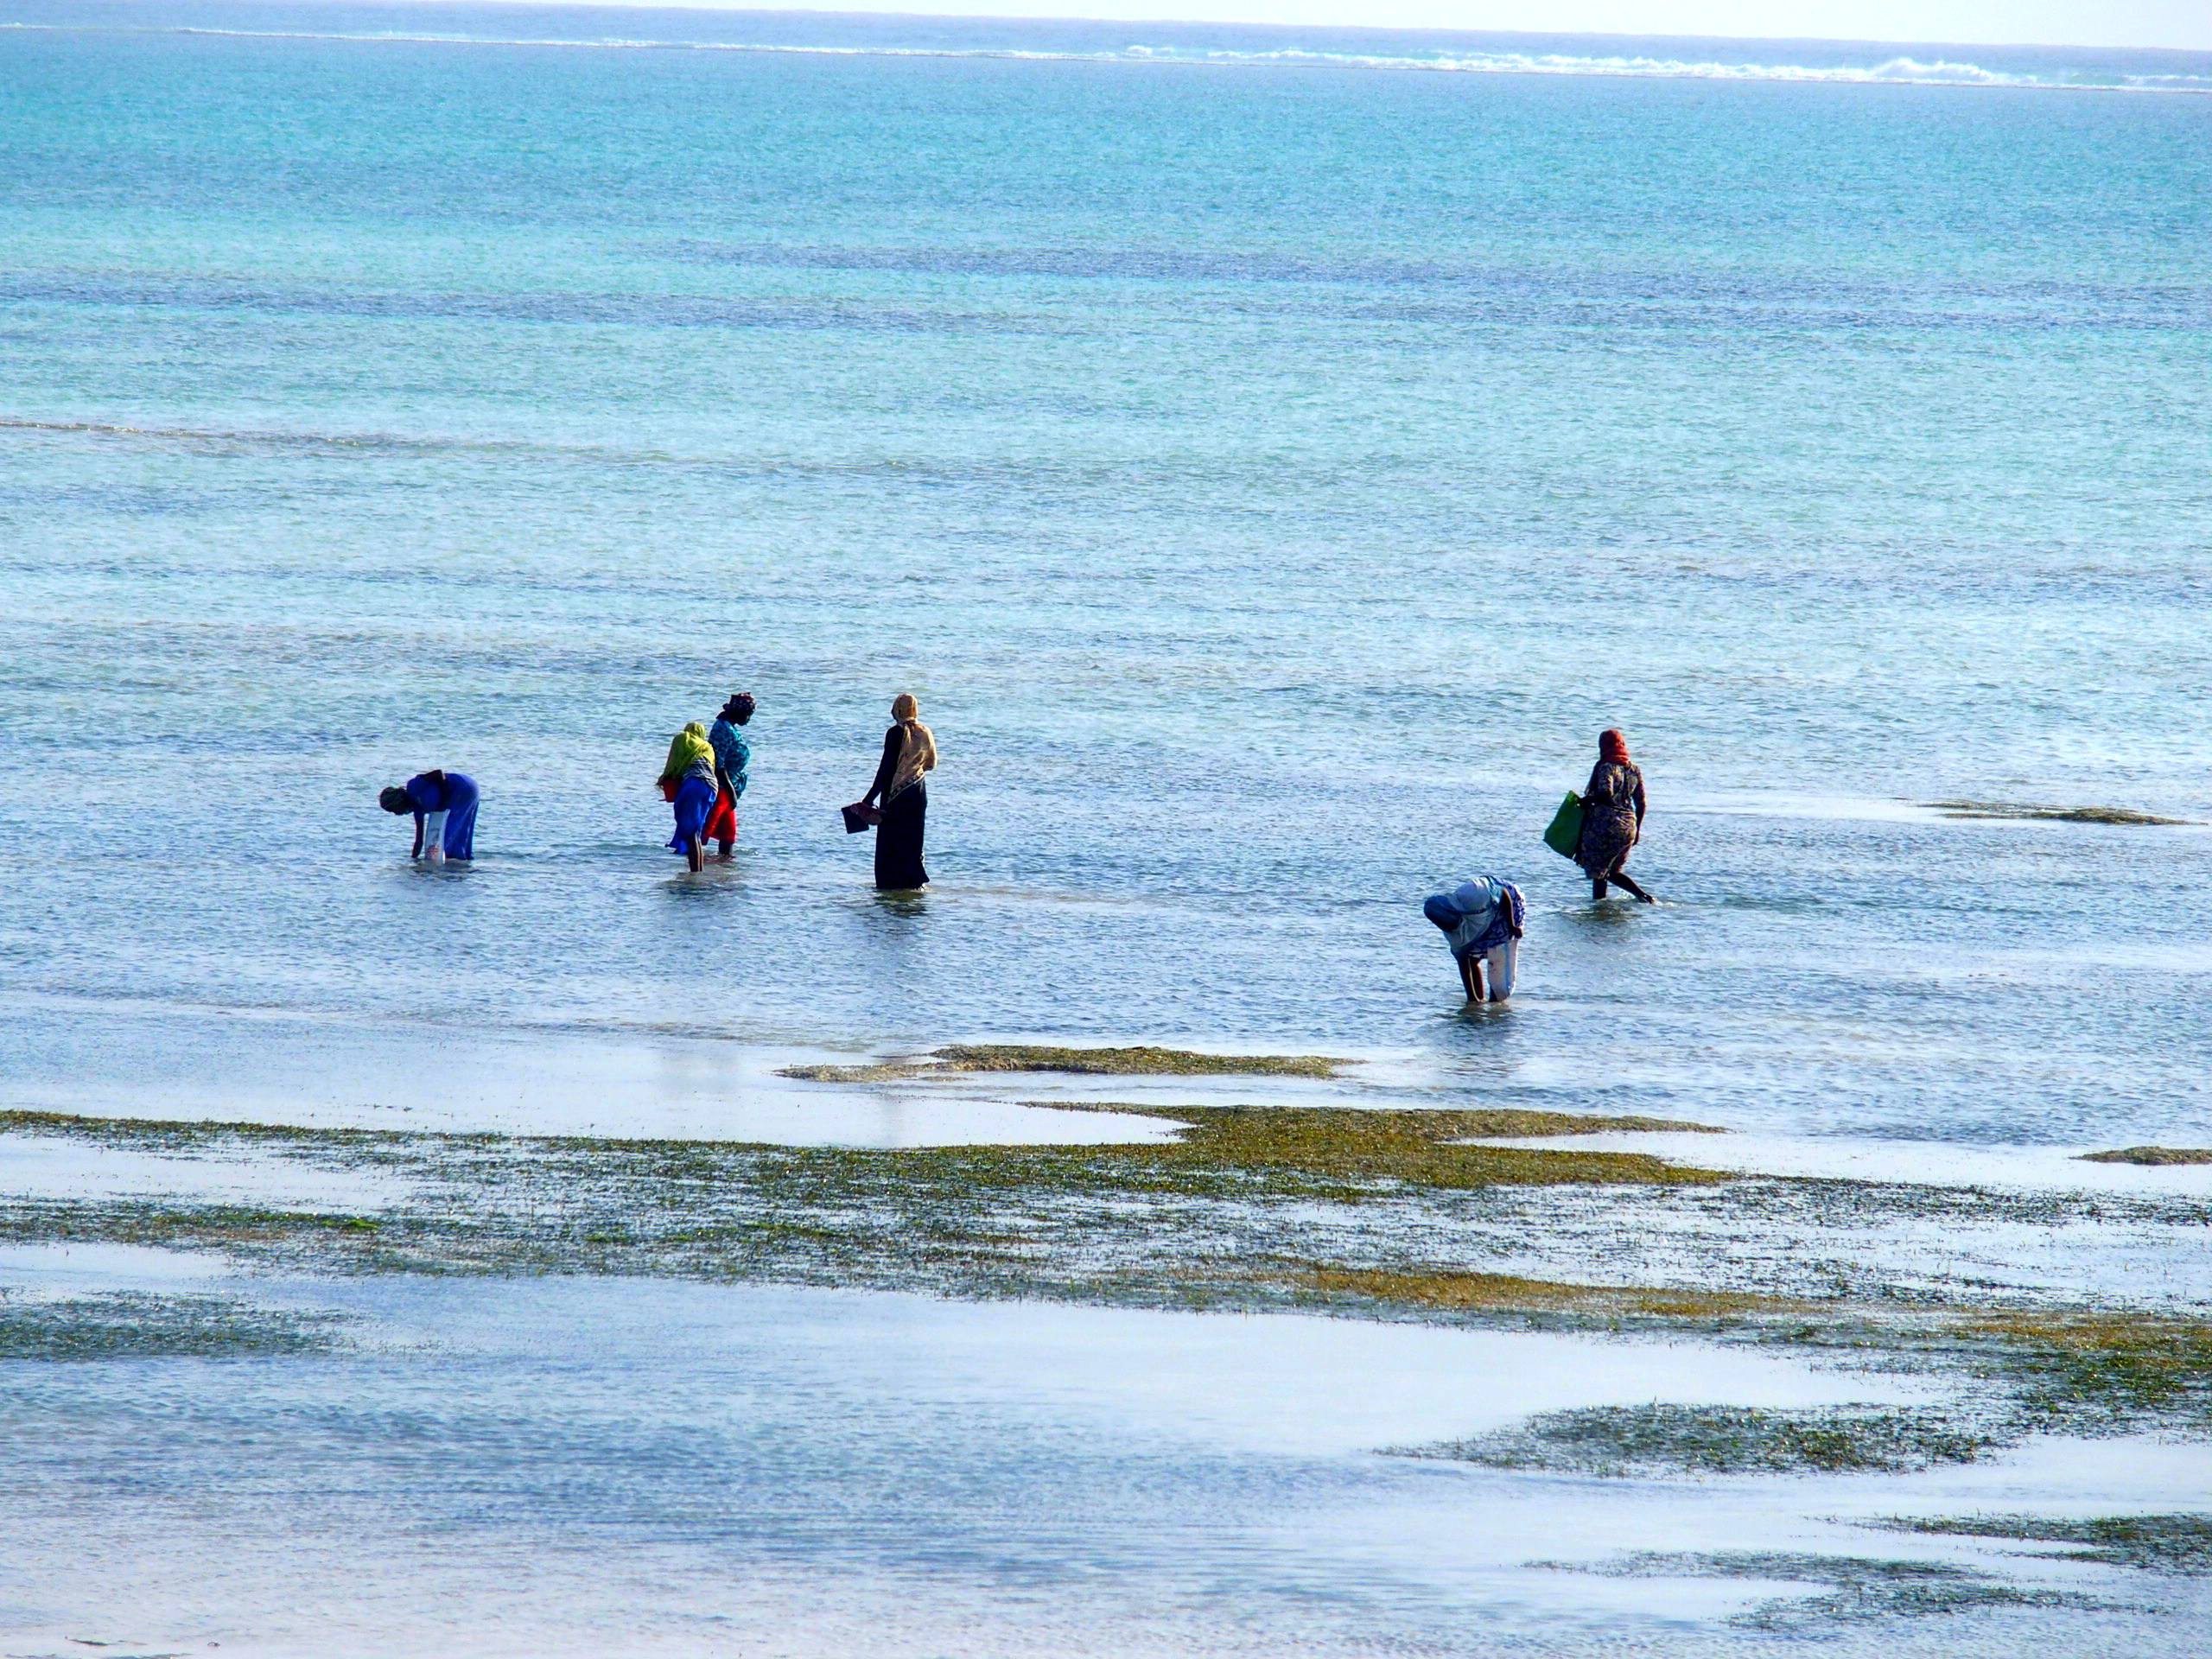 Ramasseuses d'algues au travail Pongwe Zanzibar